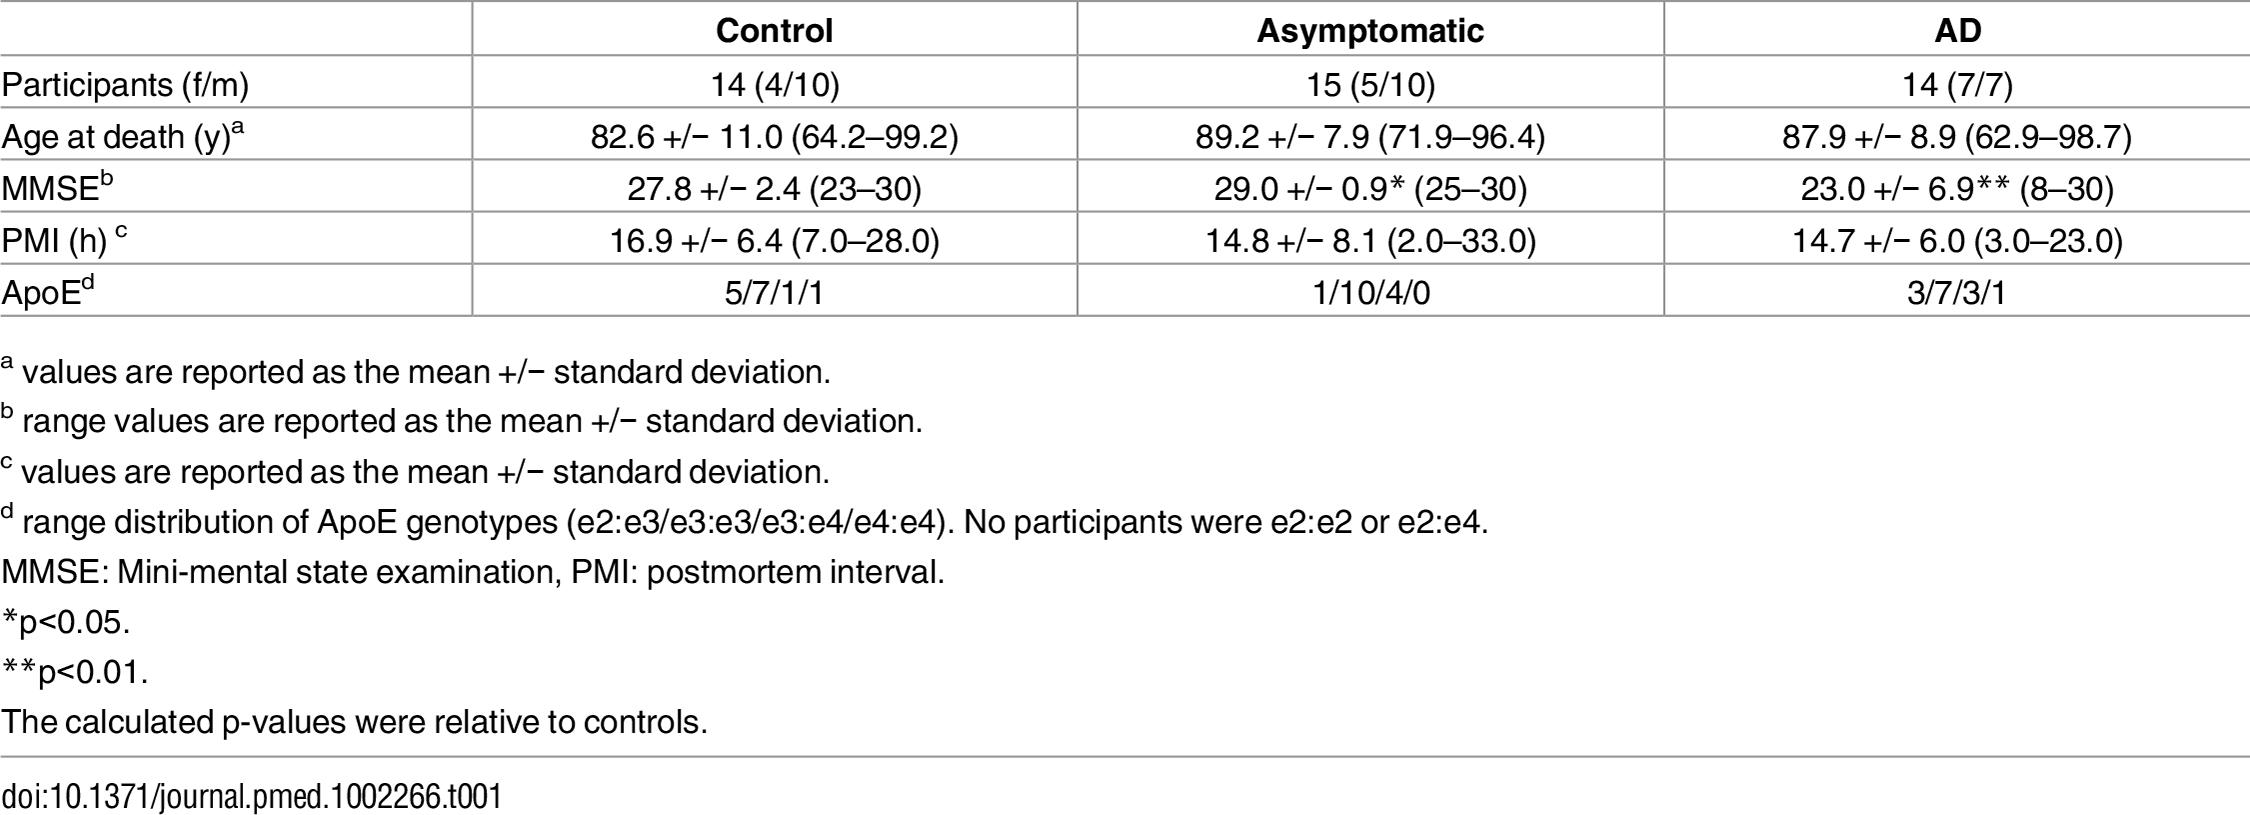 Clinical characteristics of study participants.